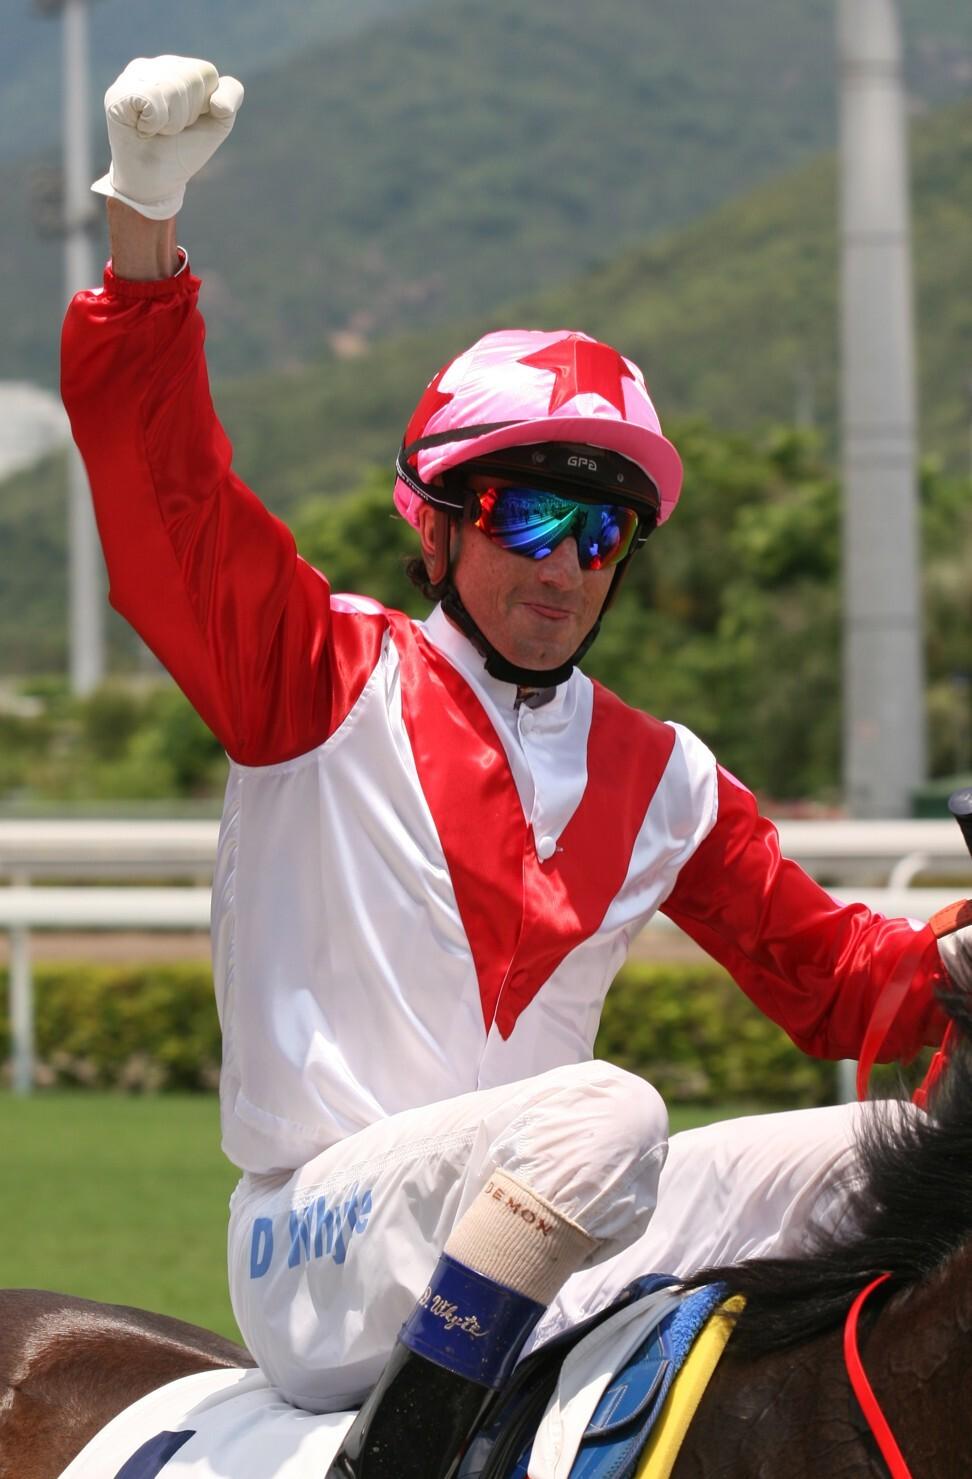 Douglas Whyte returns after winning aboard Congratulation in 2007.